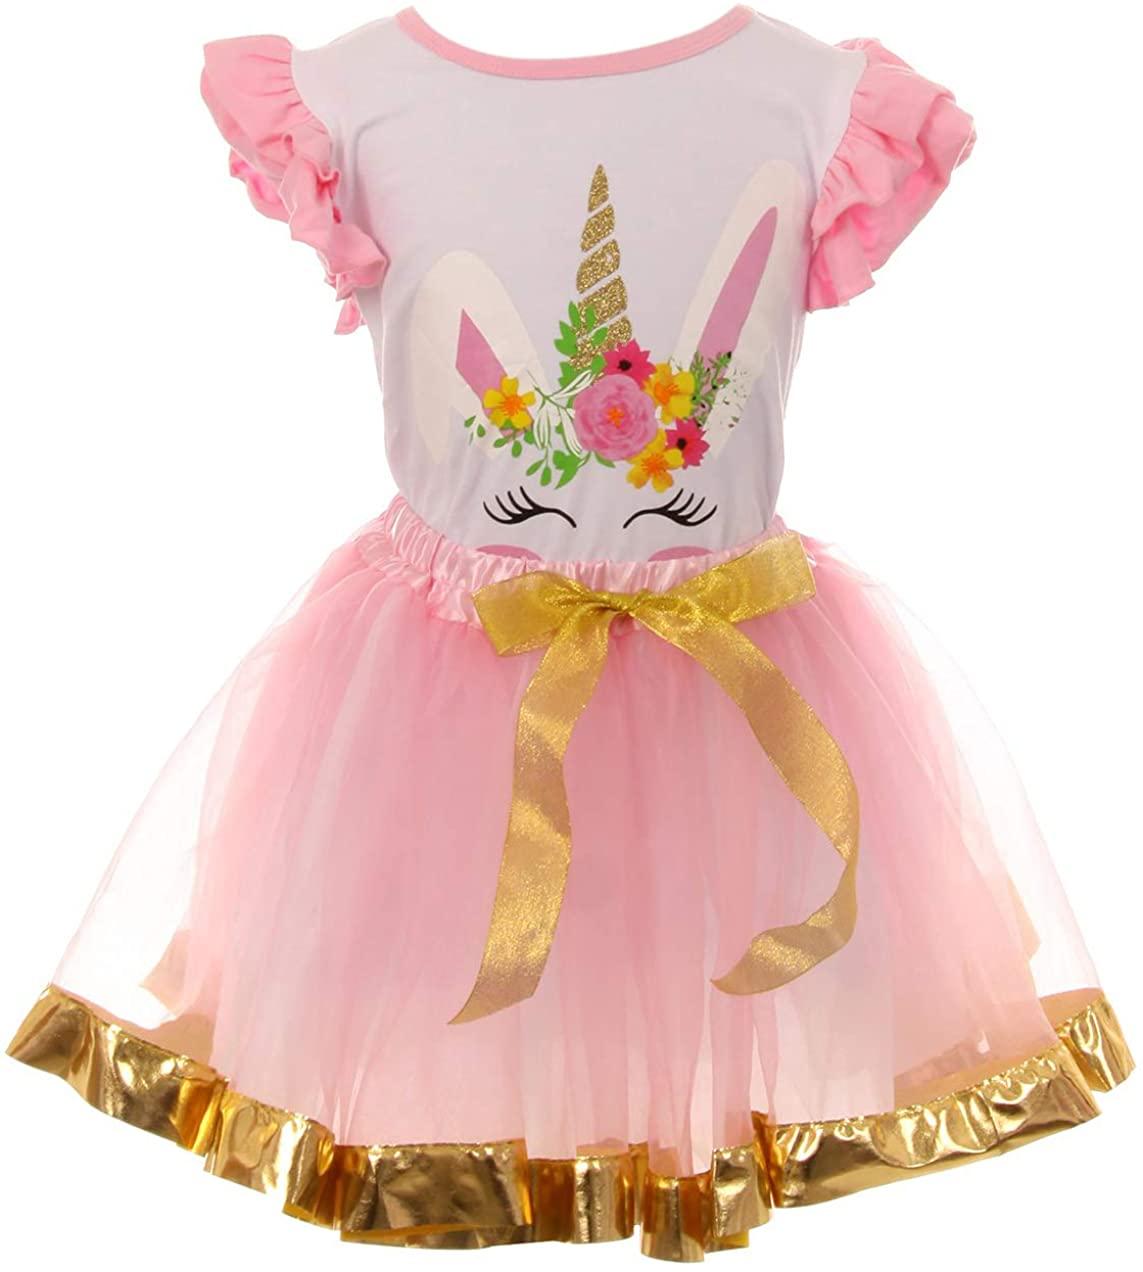 Girls 2 Pieces Skirt Set Unicorn T Shirt Top Tutu Tulle Party Kids Skirt Set